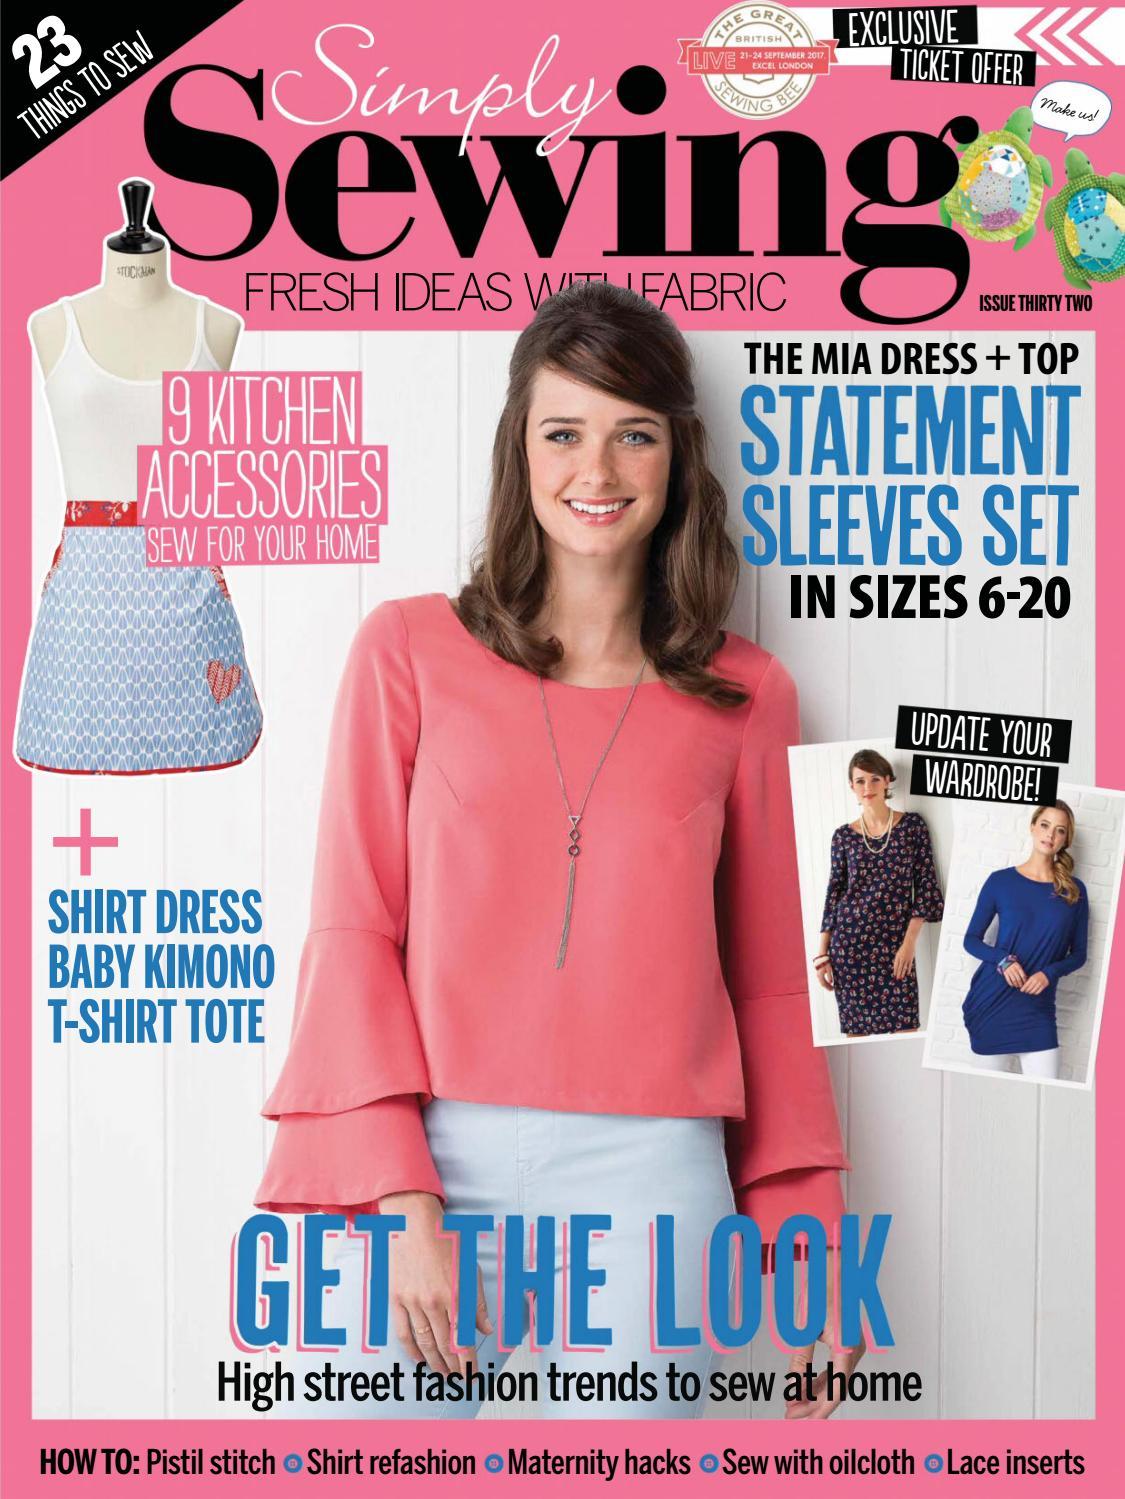 Dressmaker Sewing Machine Scissors Needles Cotton Reels Dresses Print Scarf Wrap